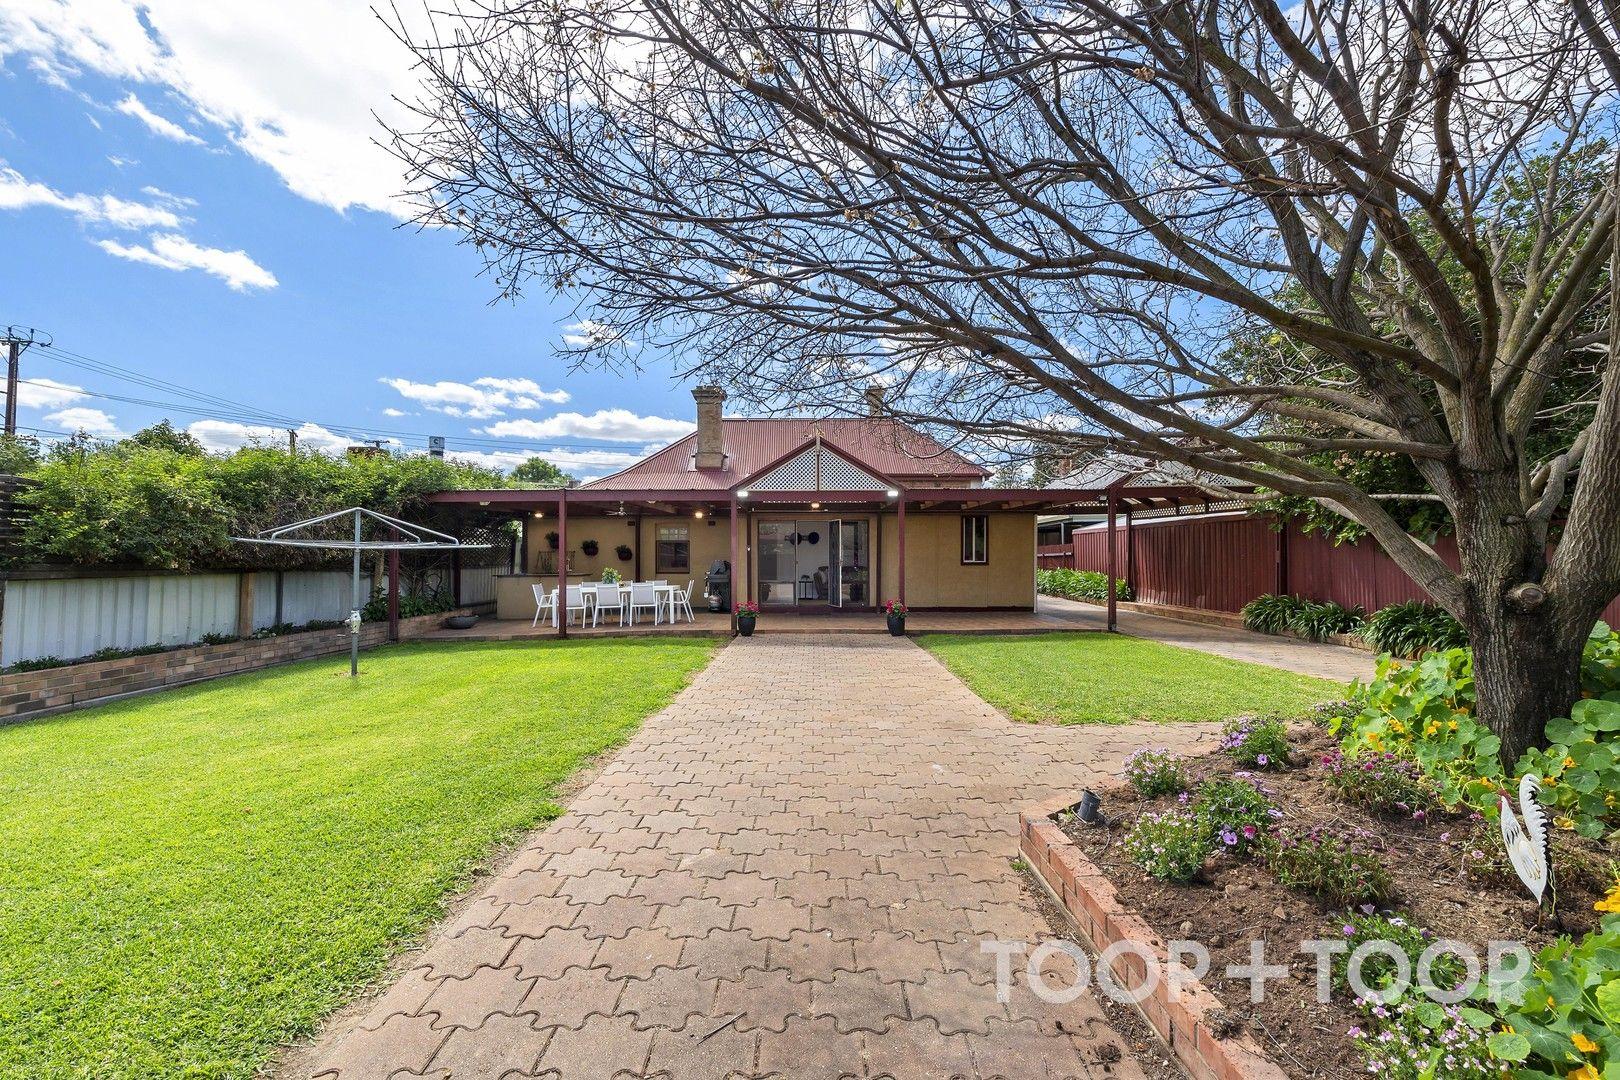 4 bedrooms House in 2-3 Aroha Terrace FORESTVILLE SA, 5035